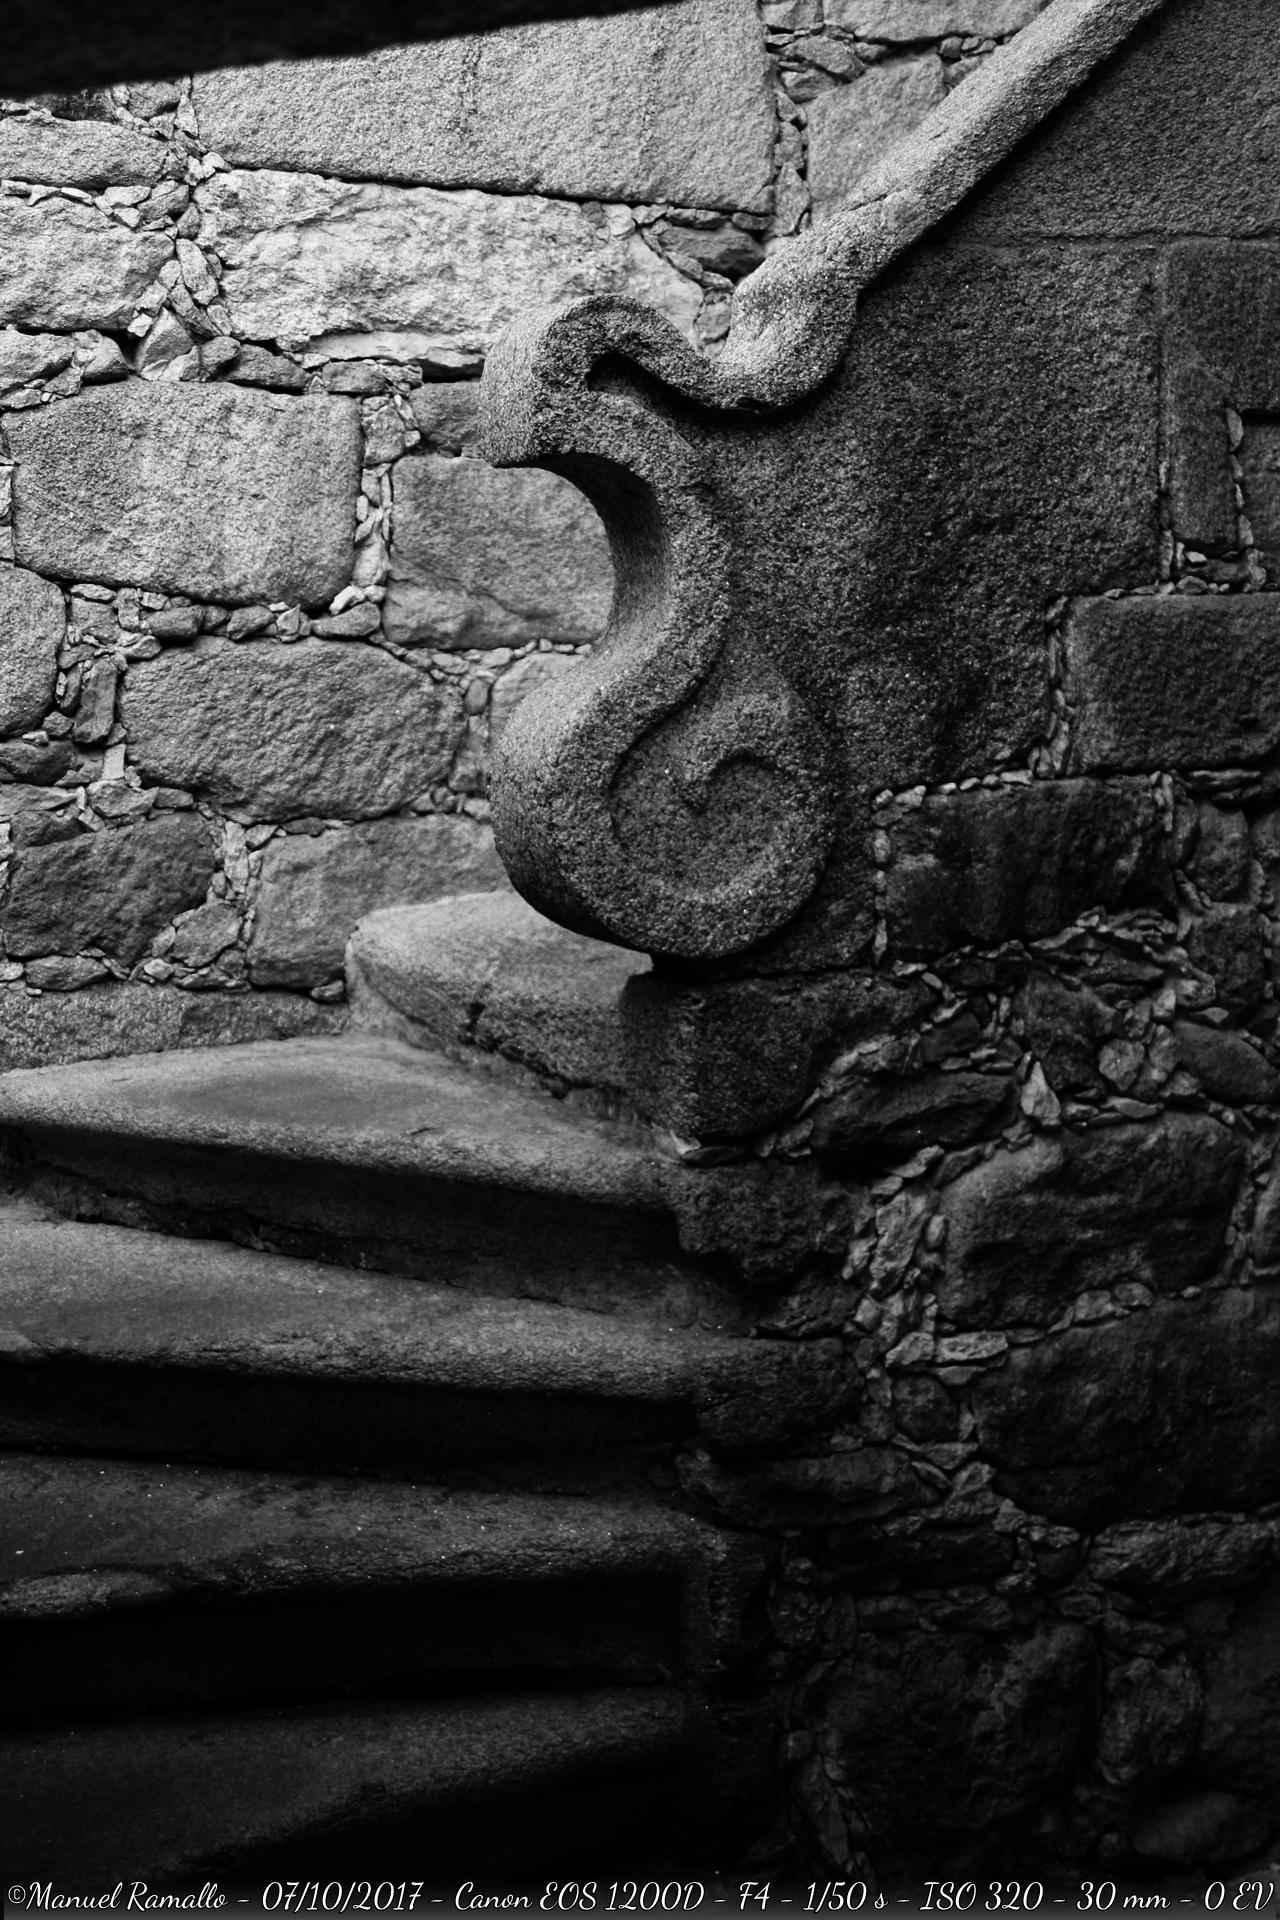 escalinata-piedra-oia-pontevedra-blanco-y-negro